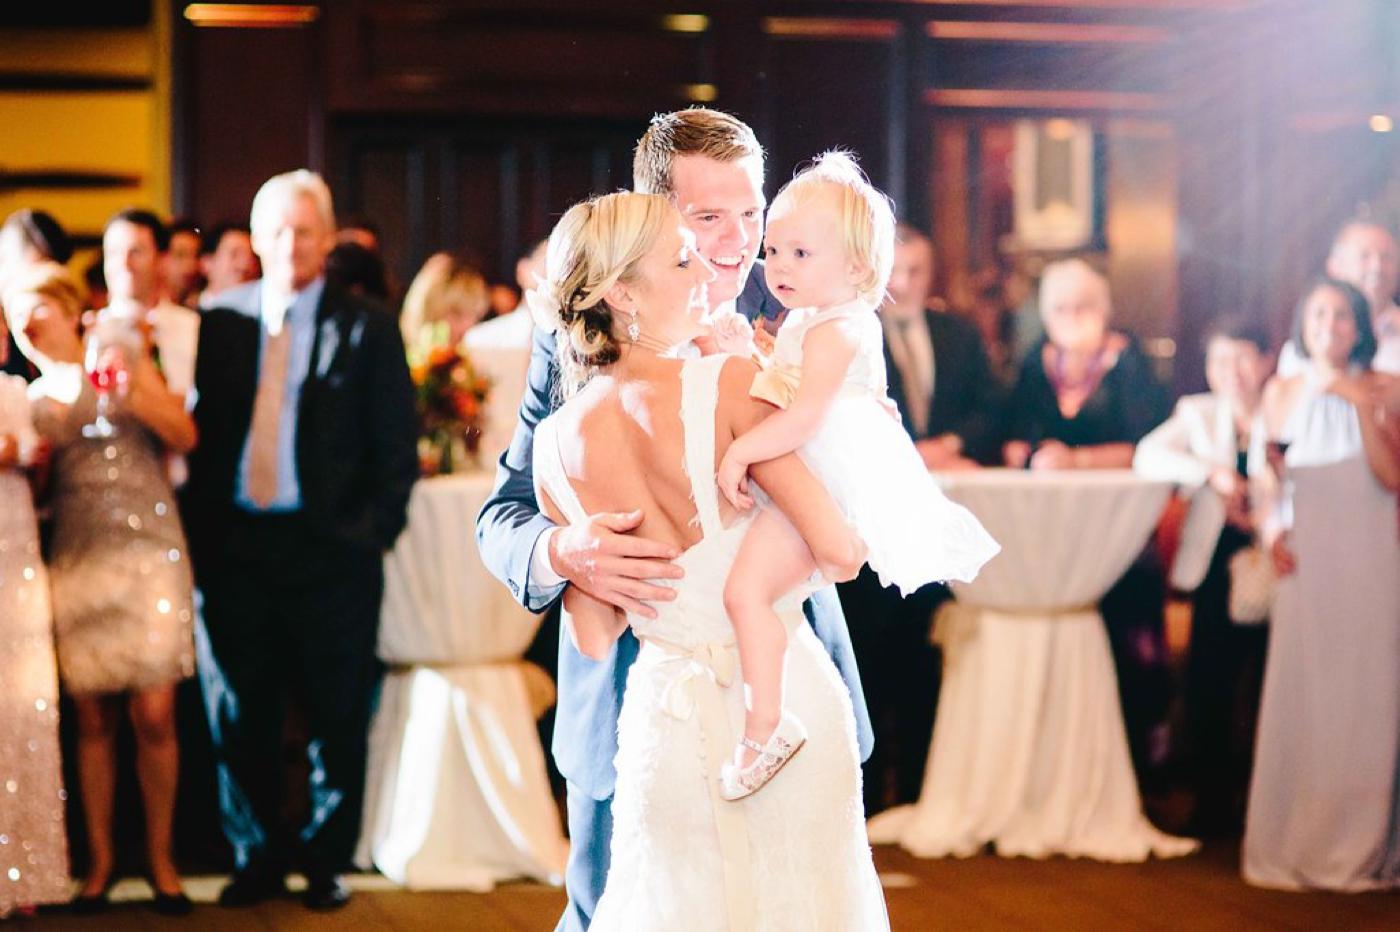 chicago-fine-art-wedding-photography-saylor41